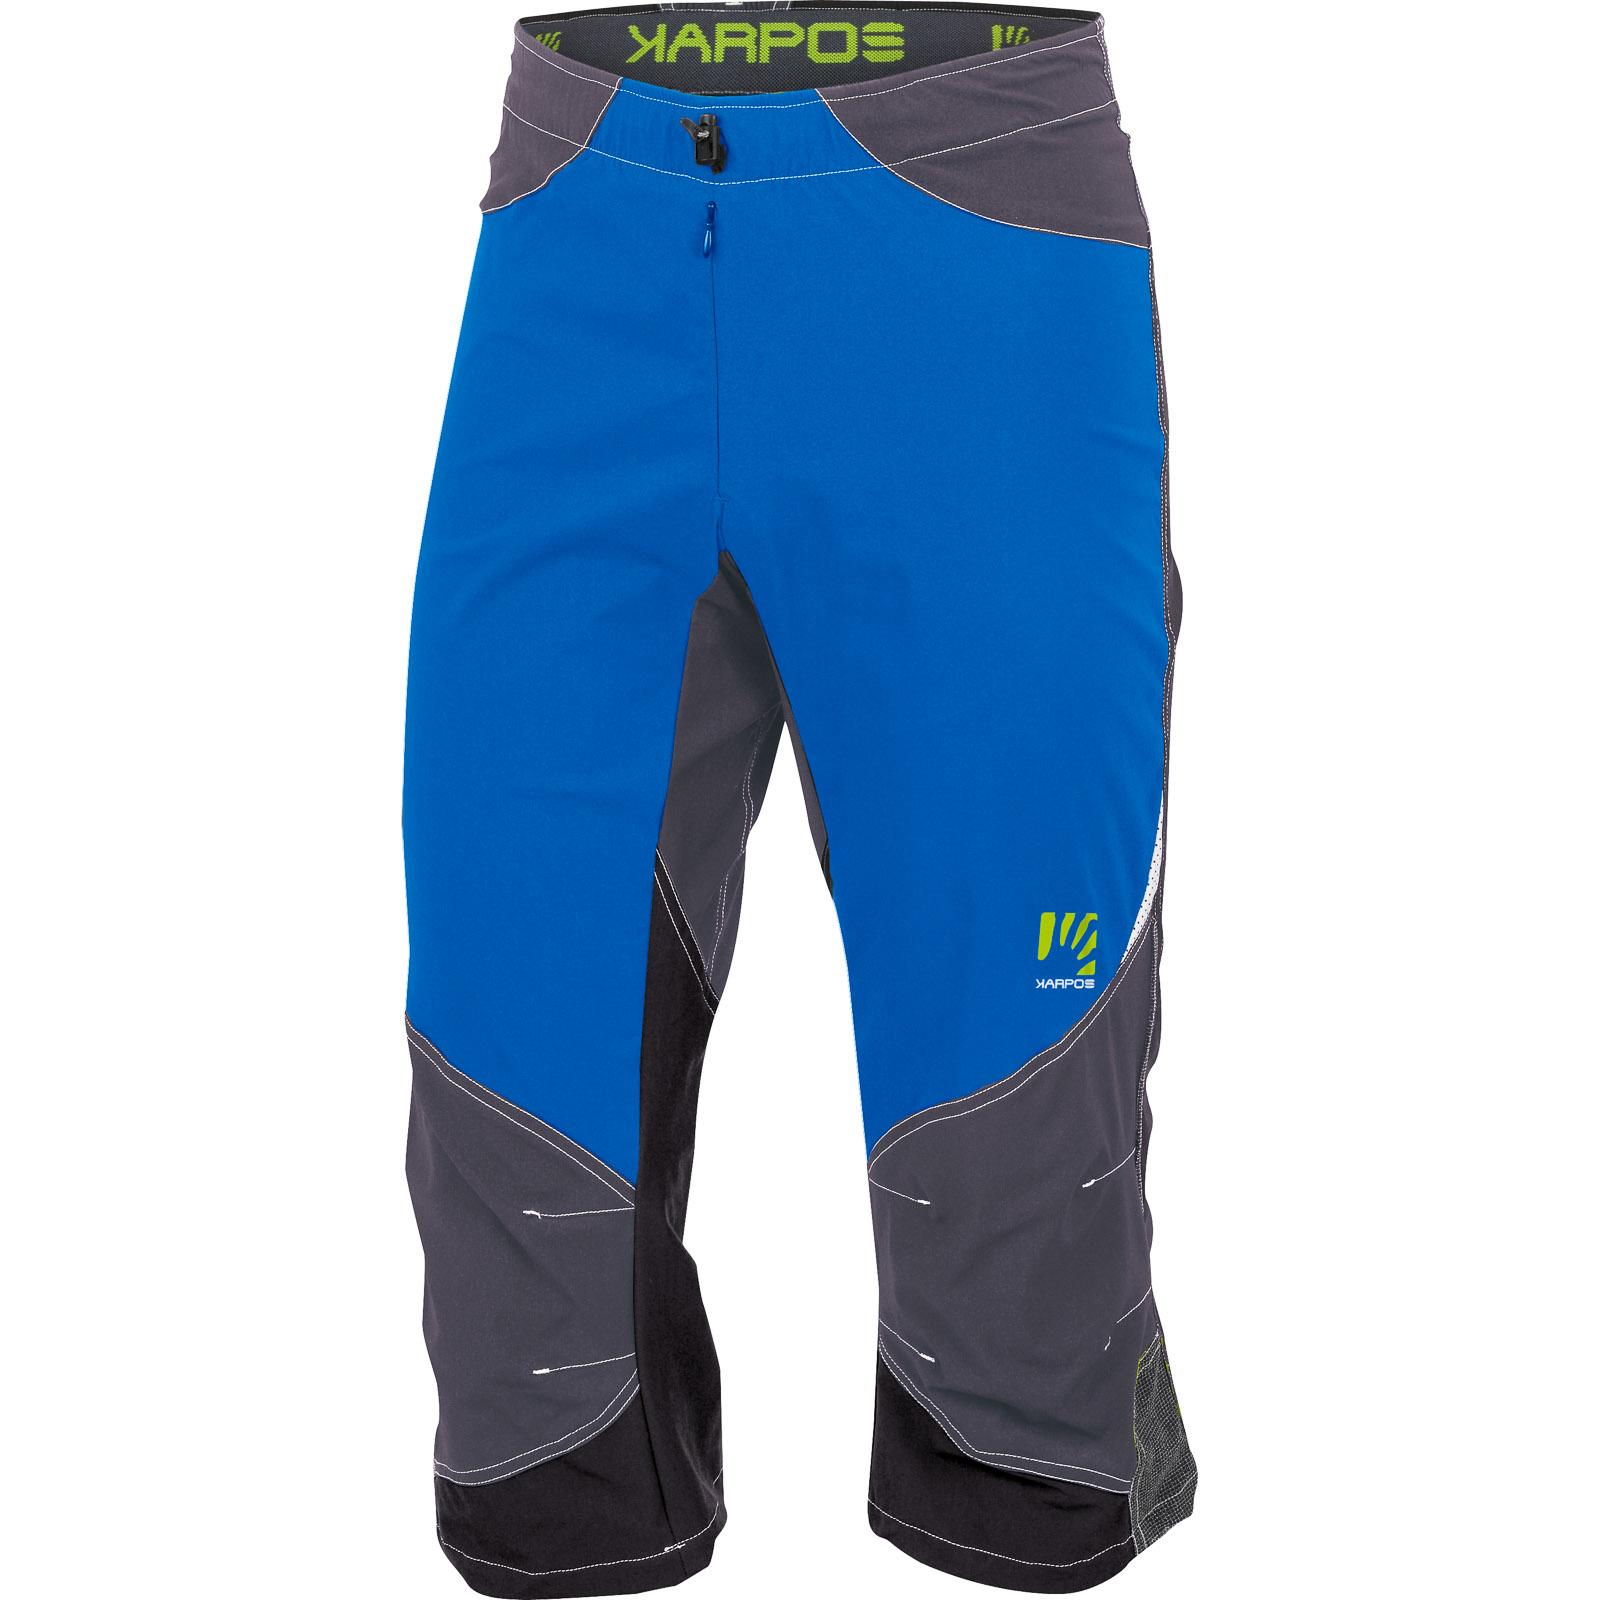 c2110e36a0aa 3 4 outdoorové nohavice Karpos Cliff modré sivé